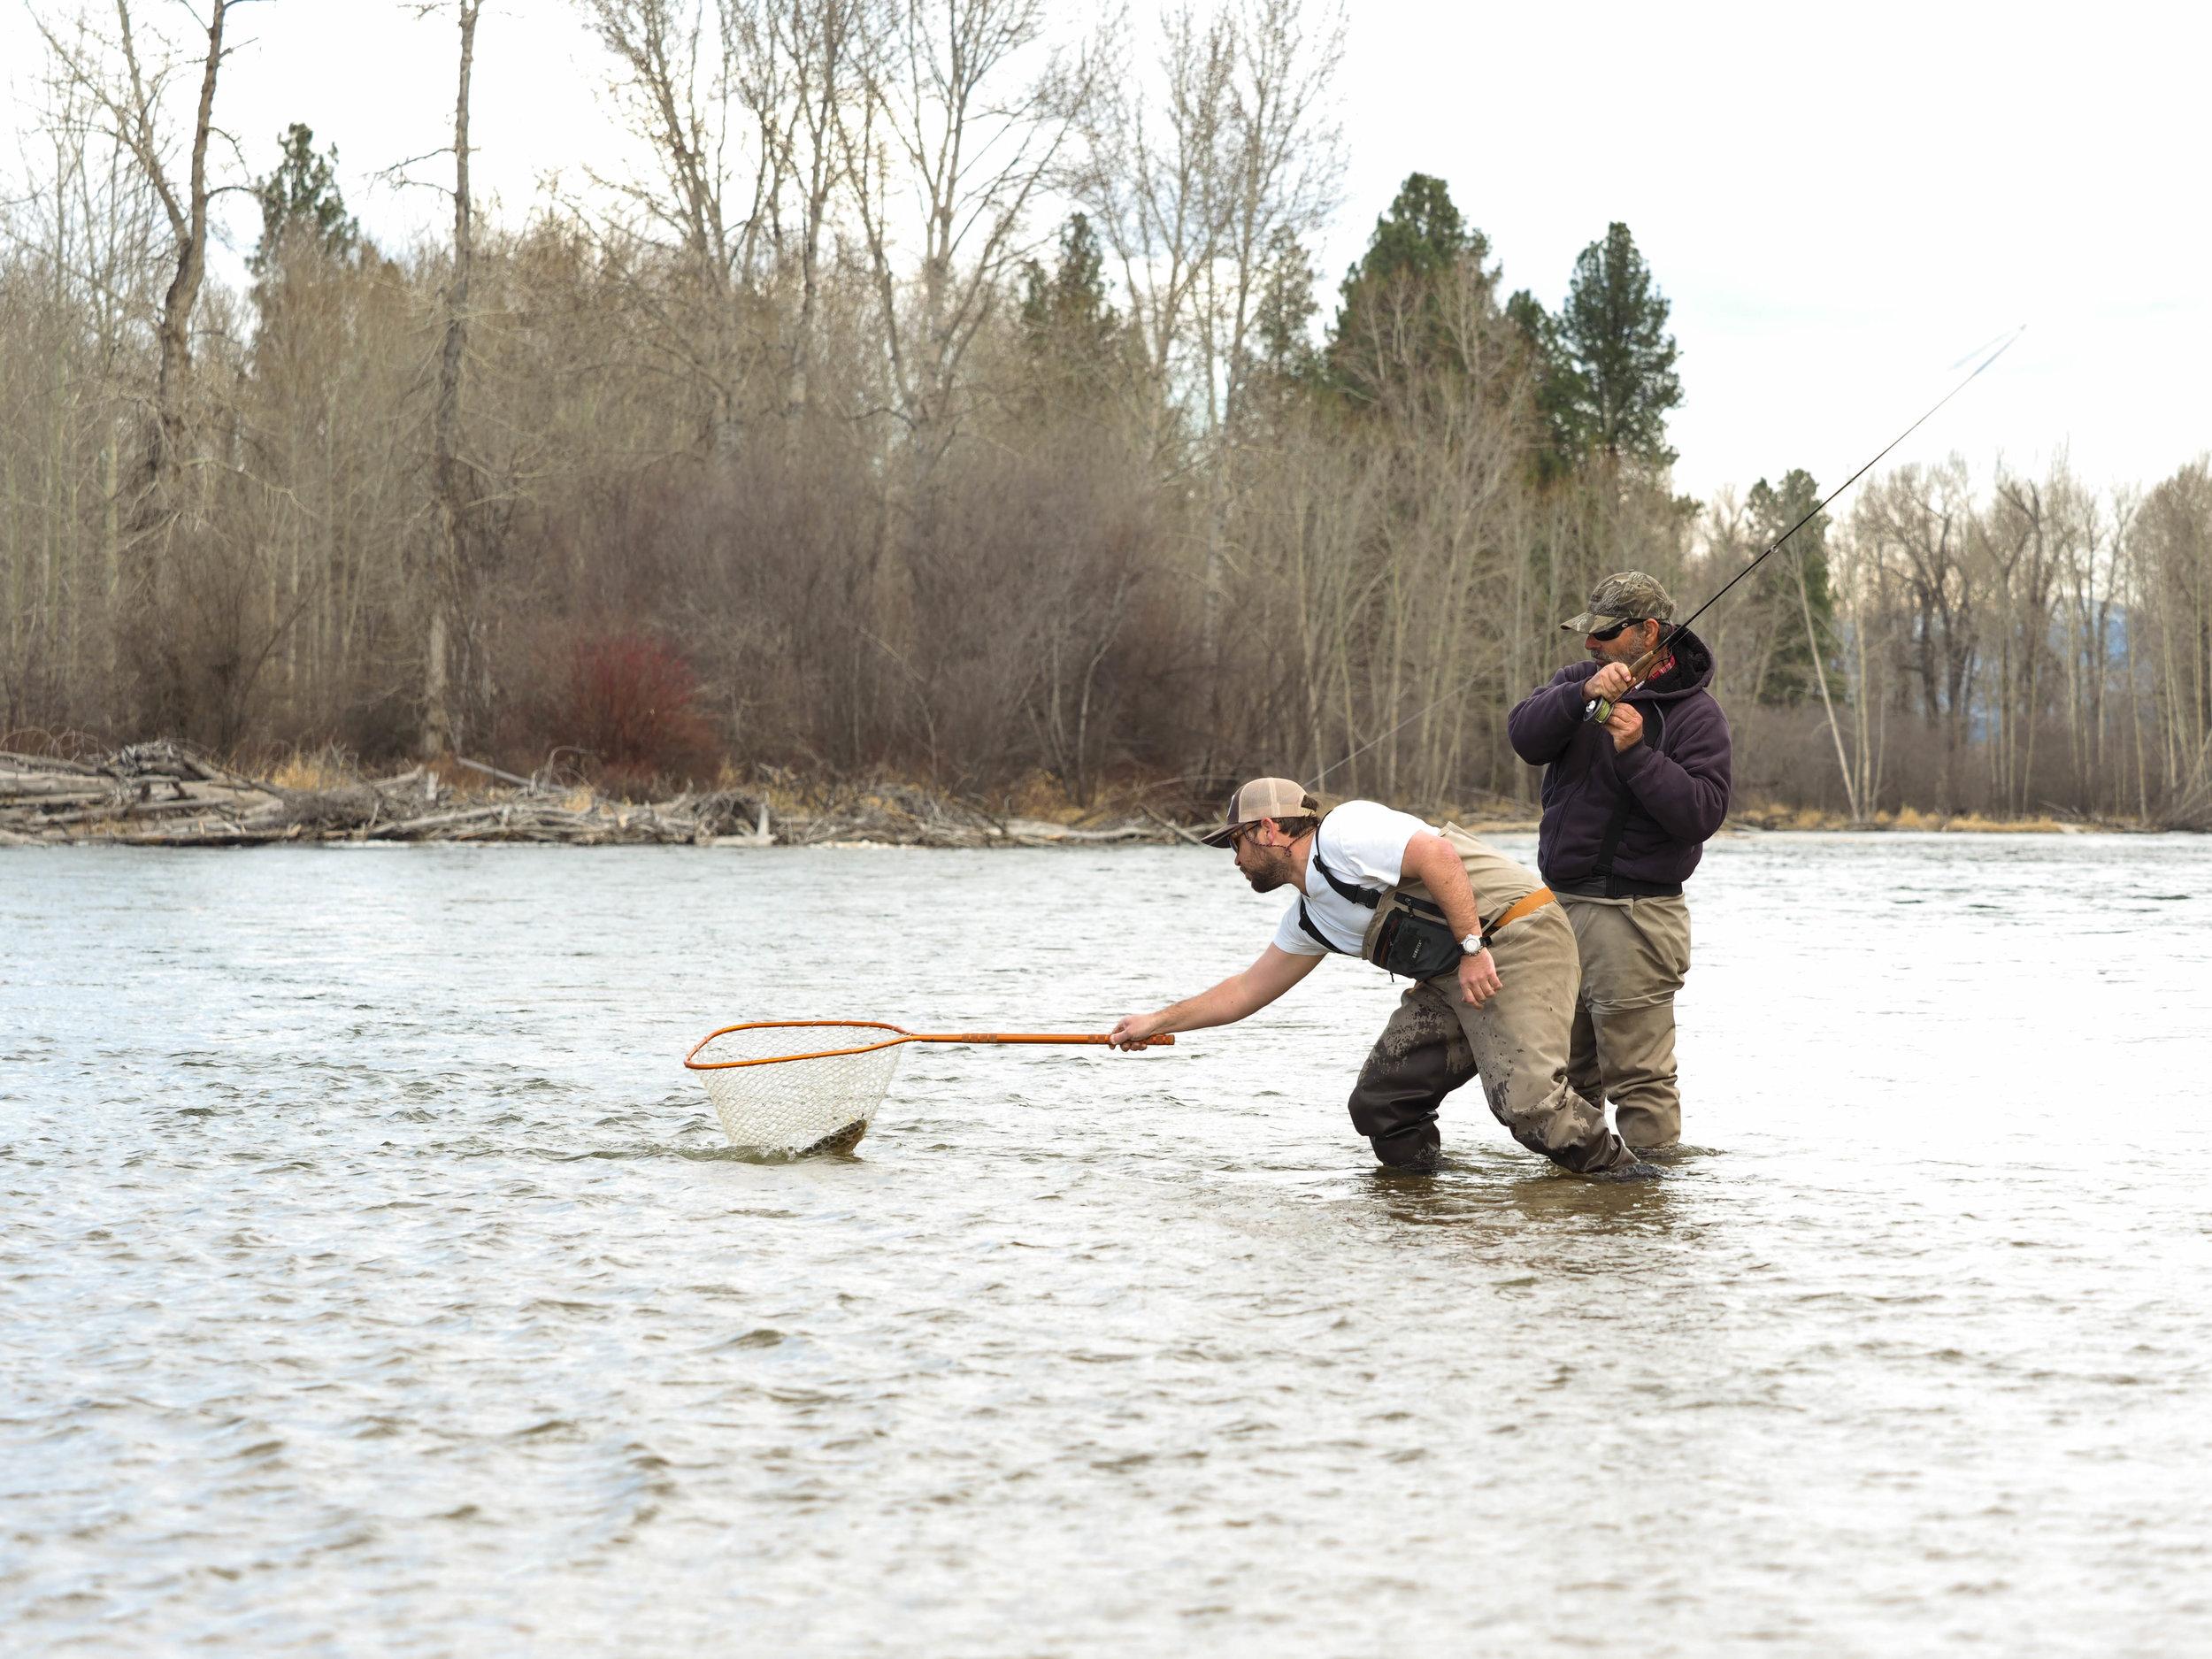 Wade fishing the Bitterroot River in Montana